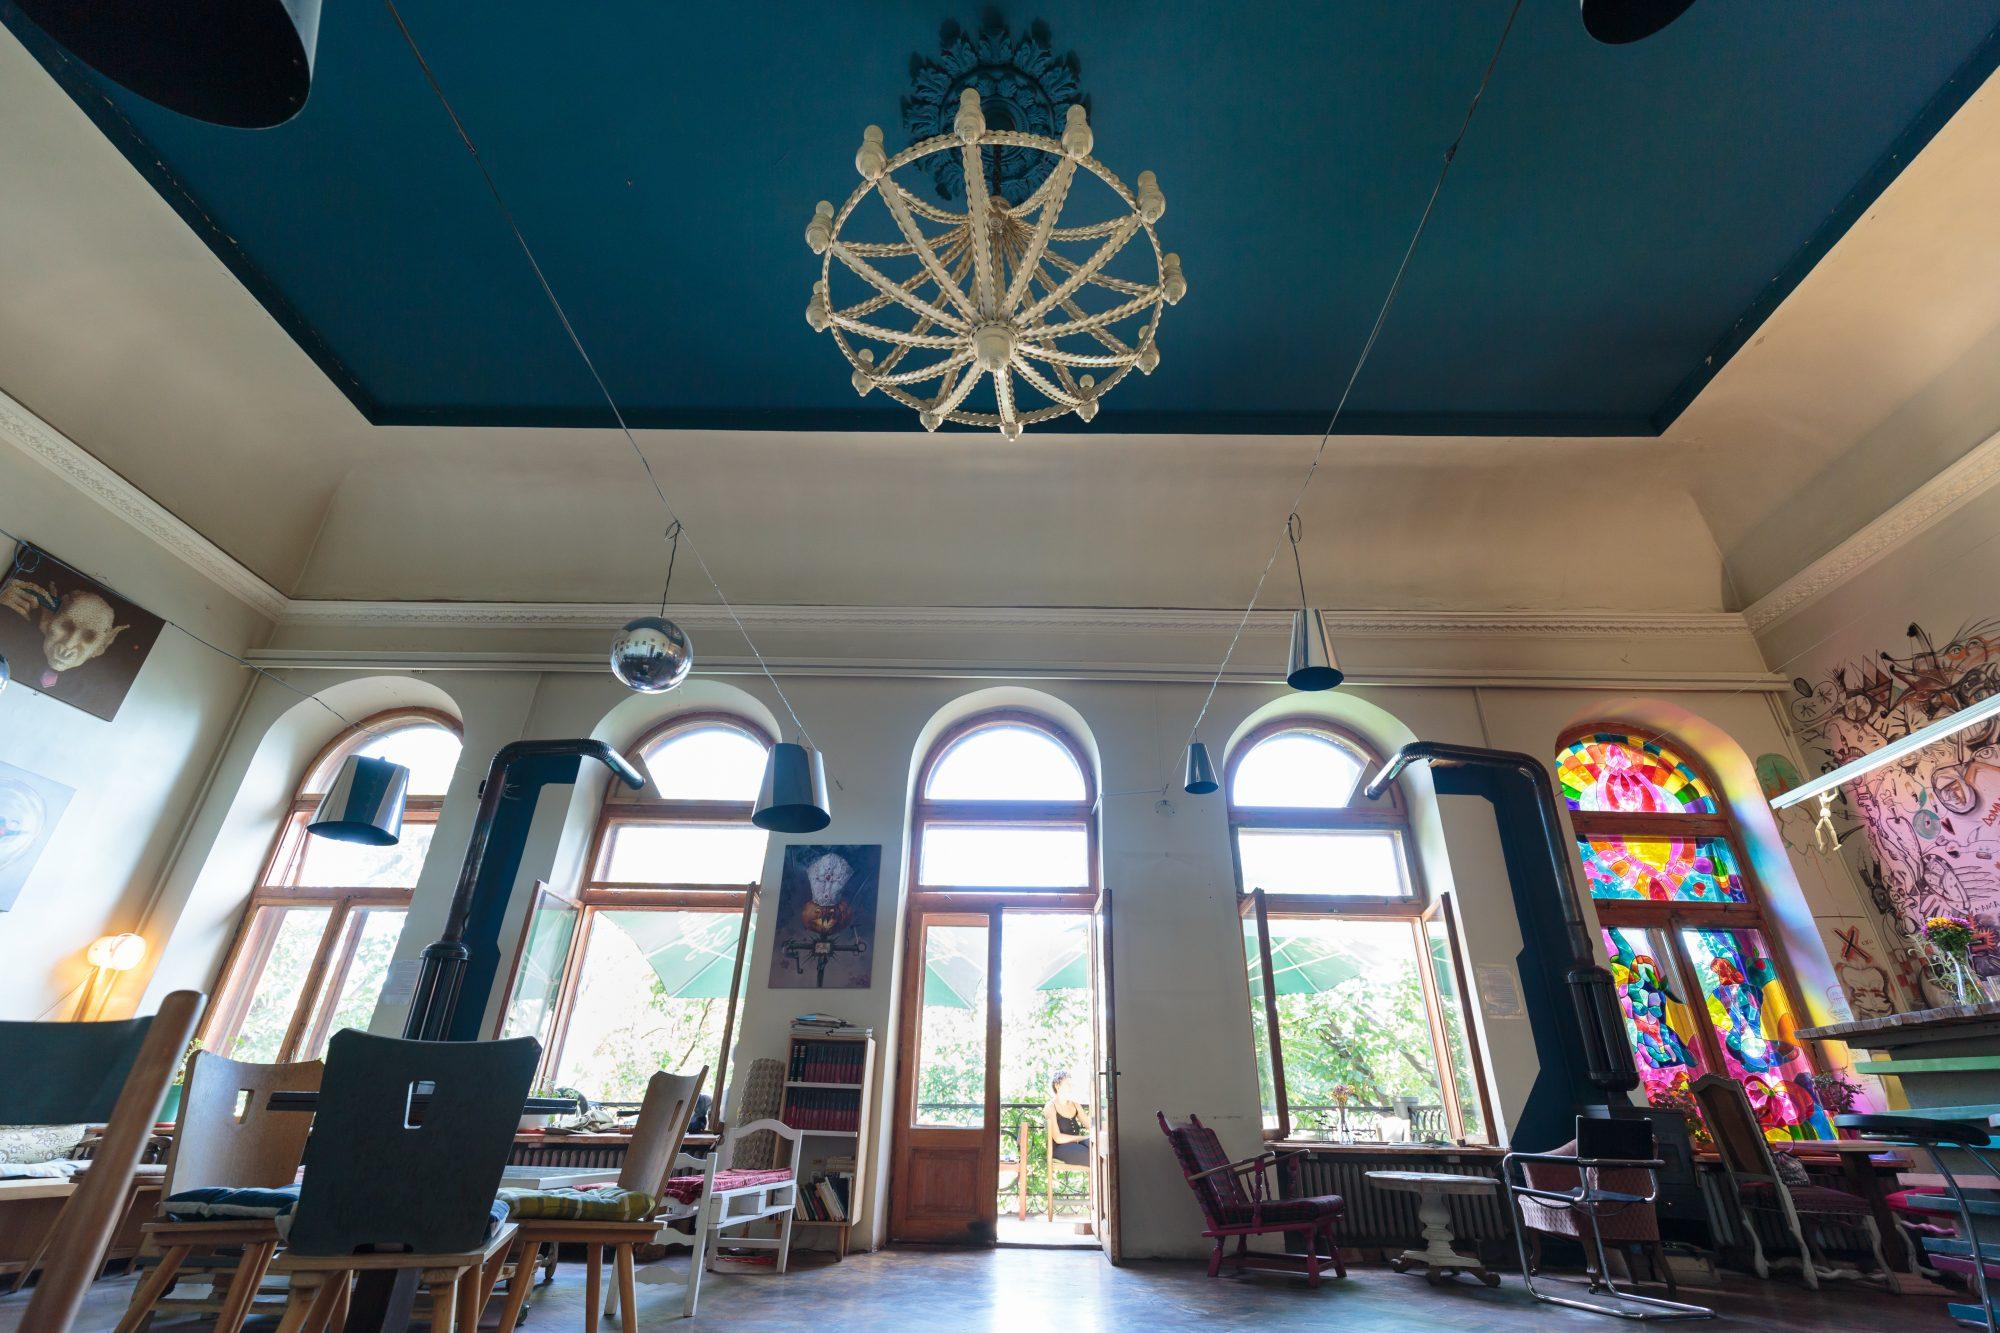 Gallery Cafe Meru